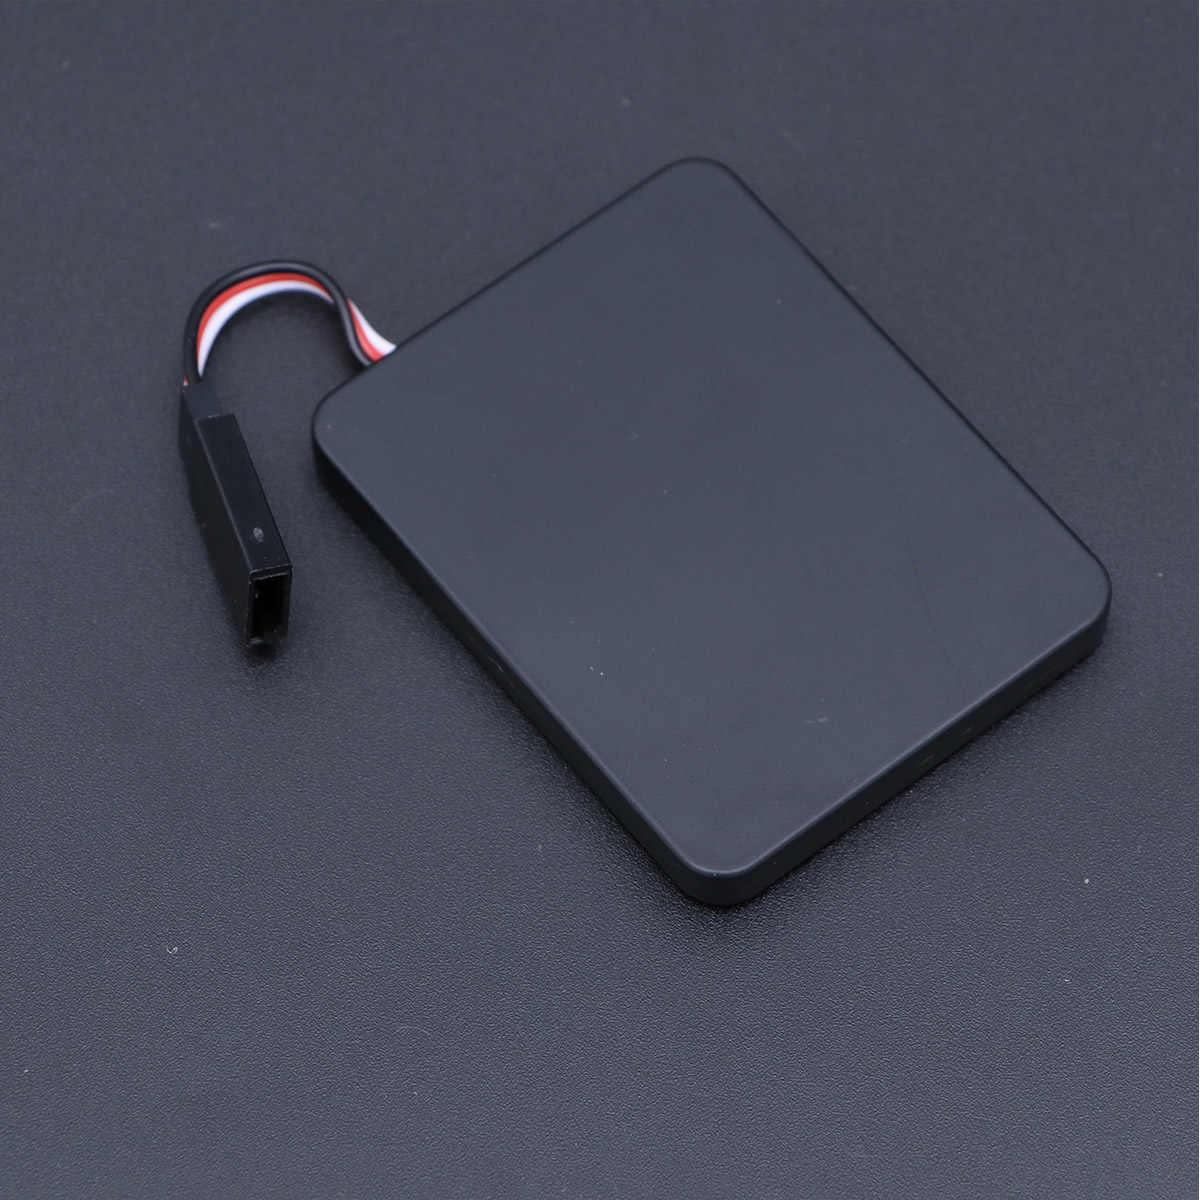 1Pc Tarjeta de programa profesional de utilidad portadora de plástico duradero LED tablero de programa efectivo para control de coches RC